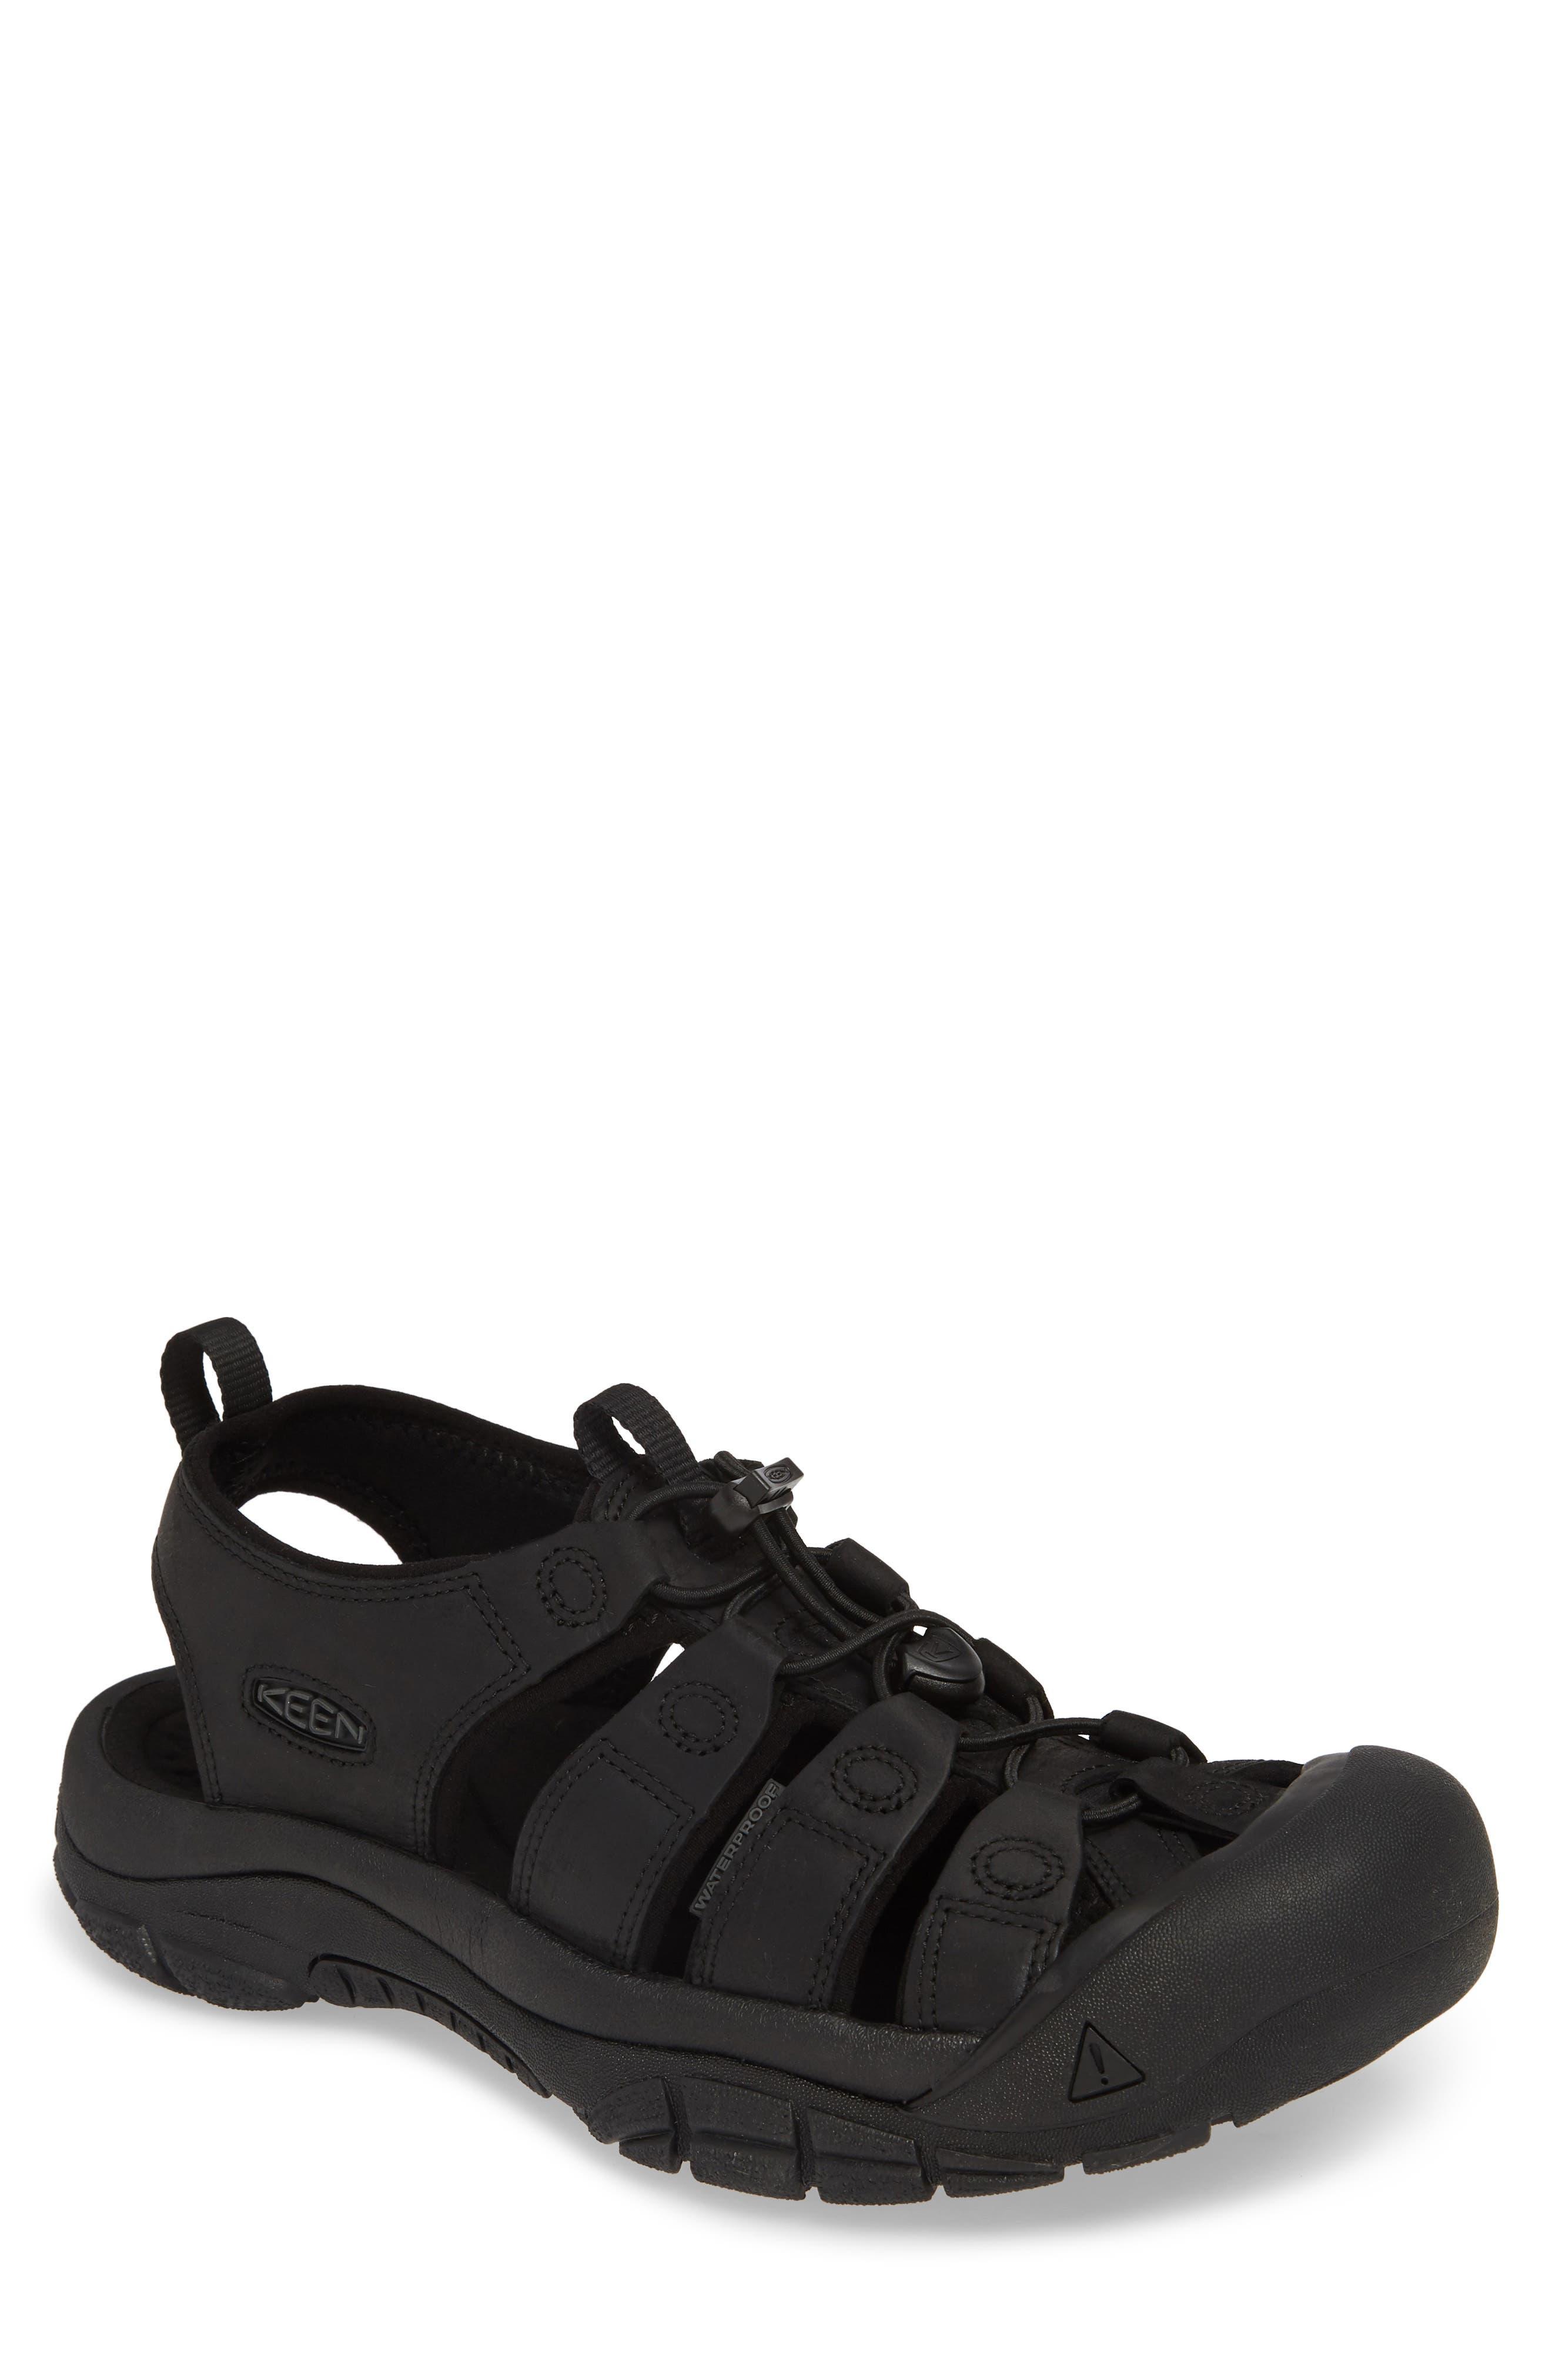 KEEN, 'Newport' Sandal, Main thumbnail 1, color, BLACK/ BLACK